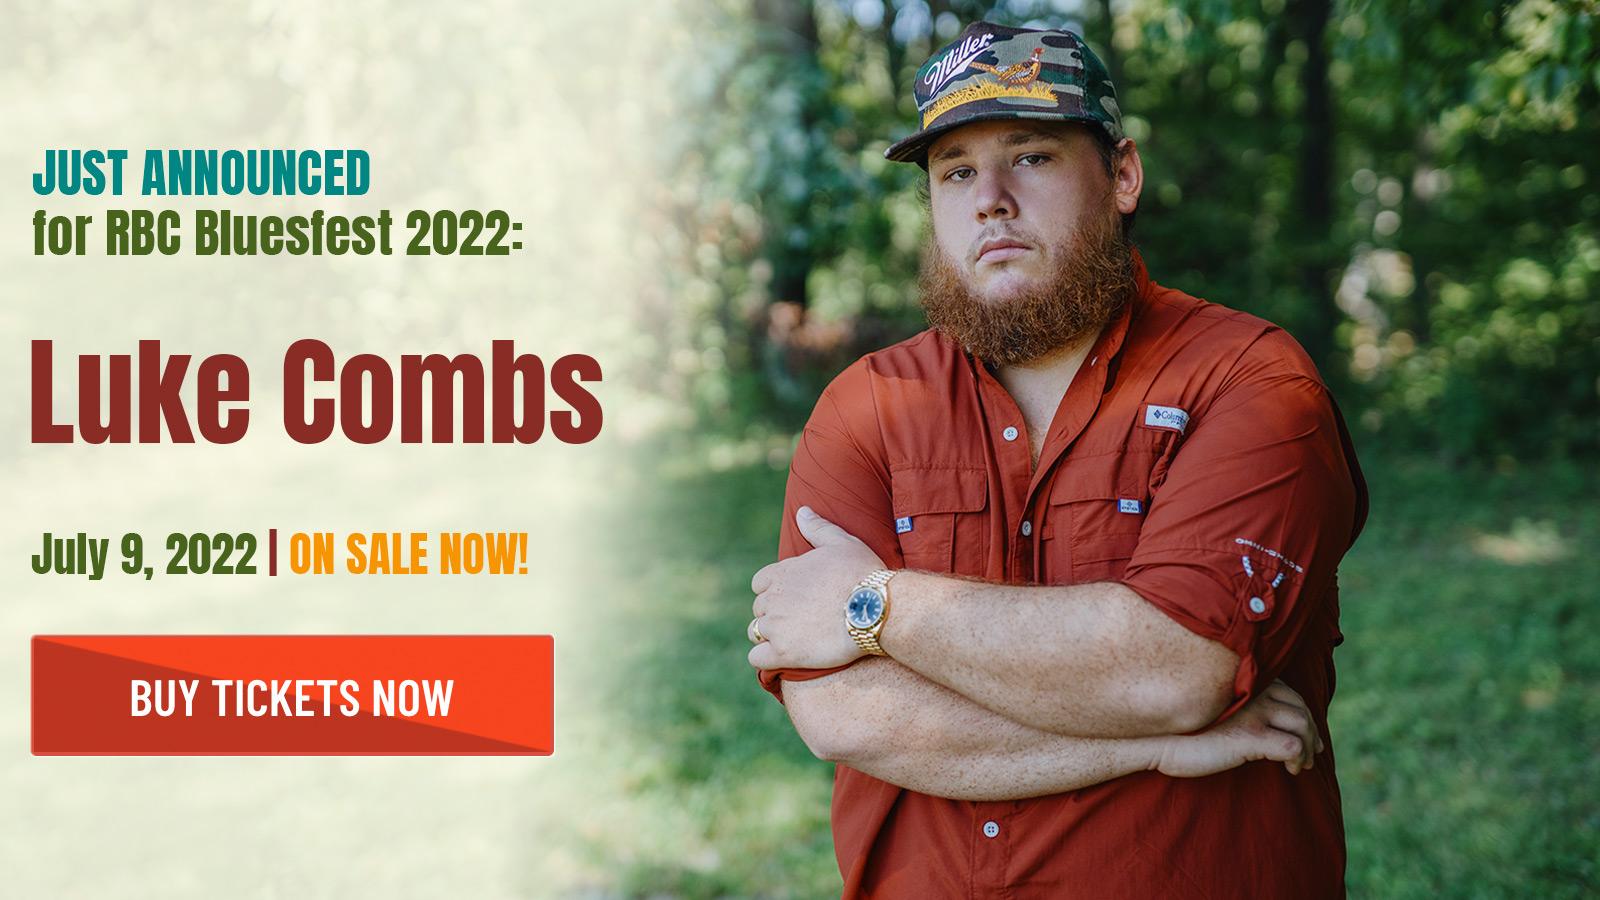 Luke Combs - July 9th, 2022 - On Sale Now!